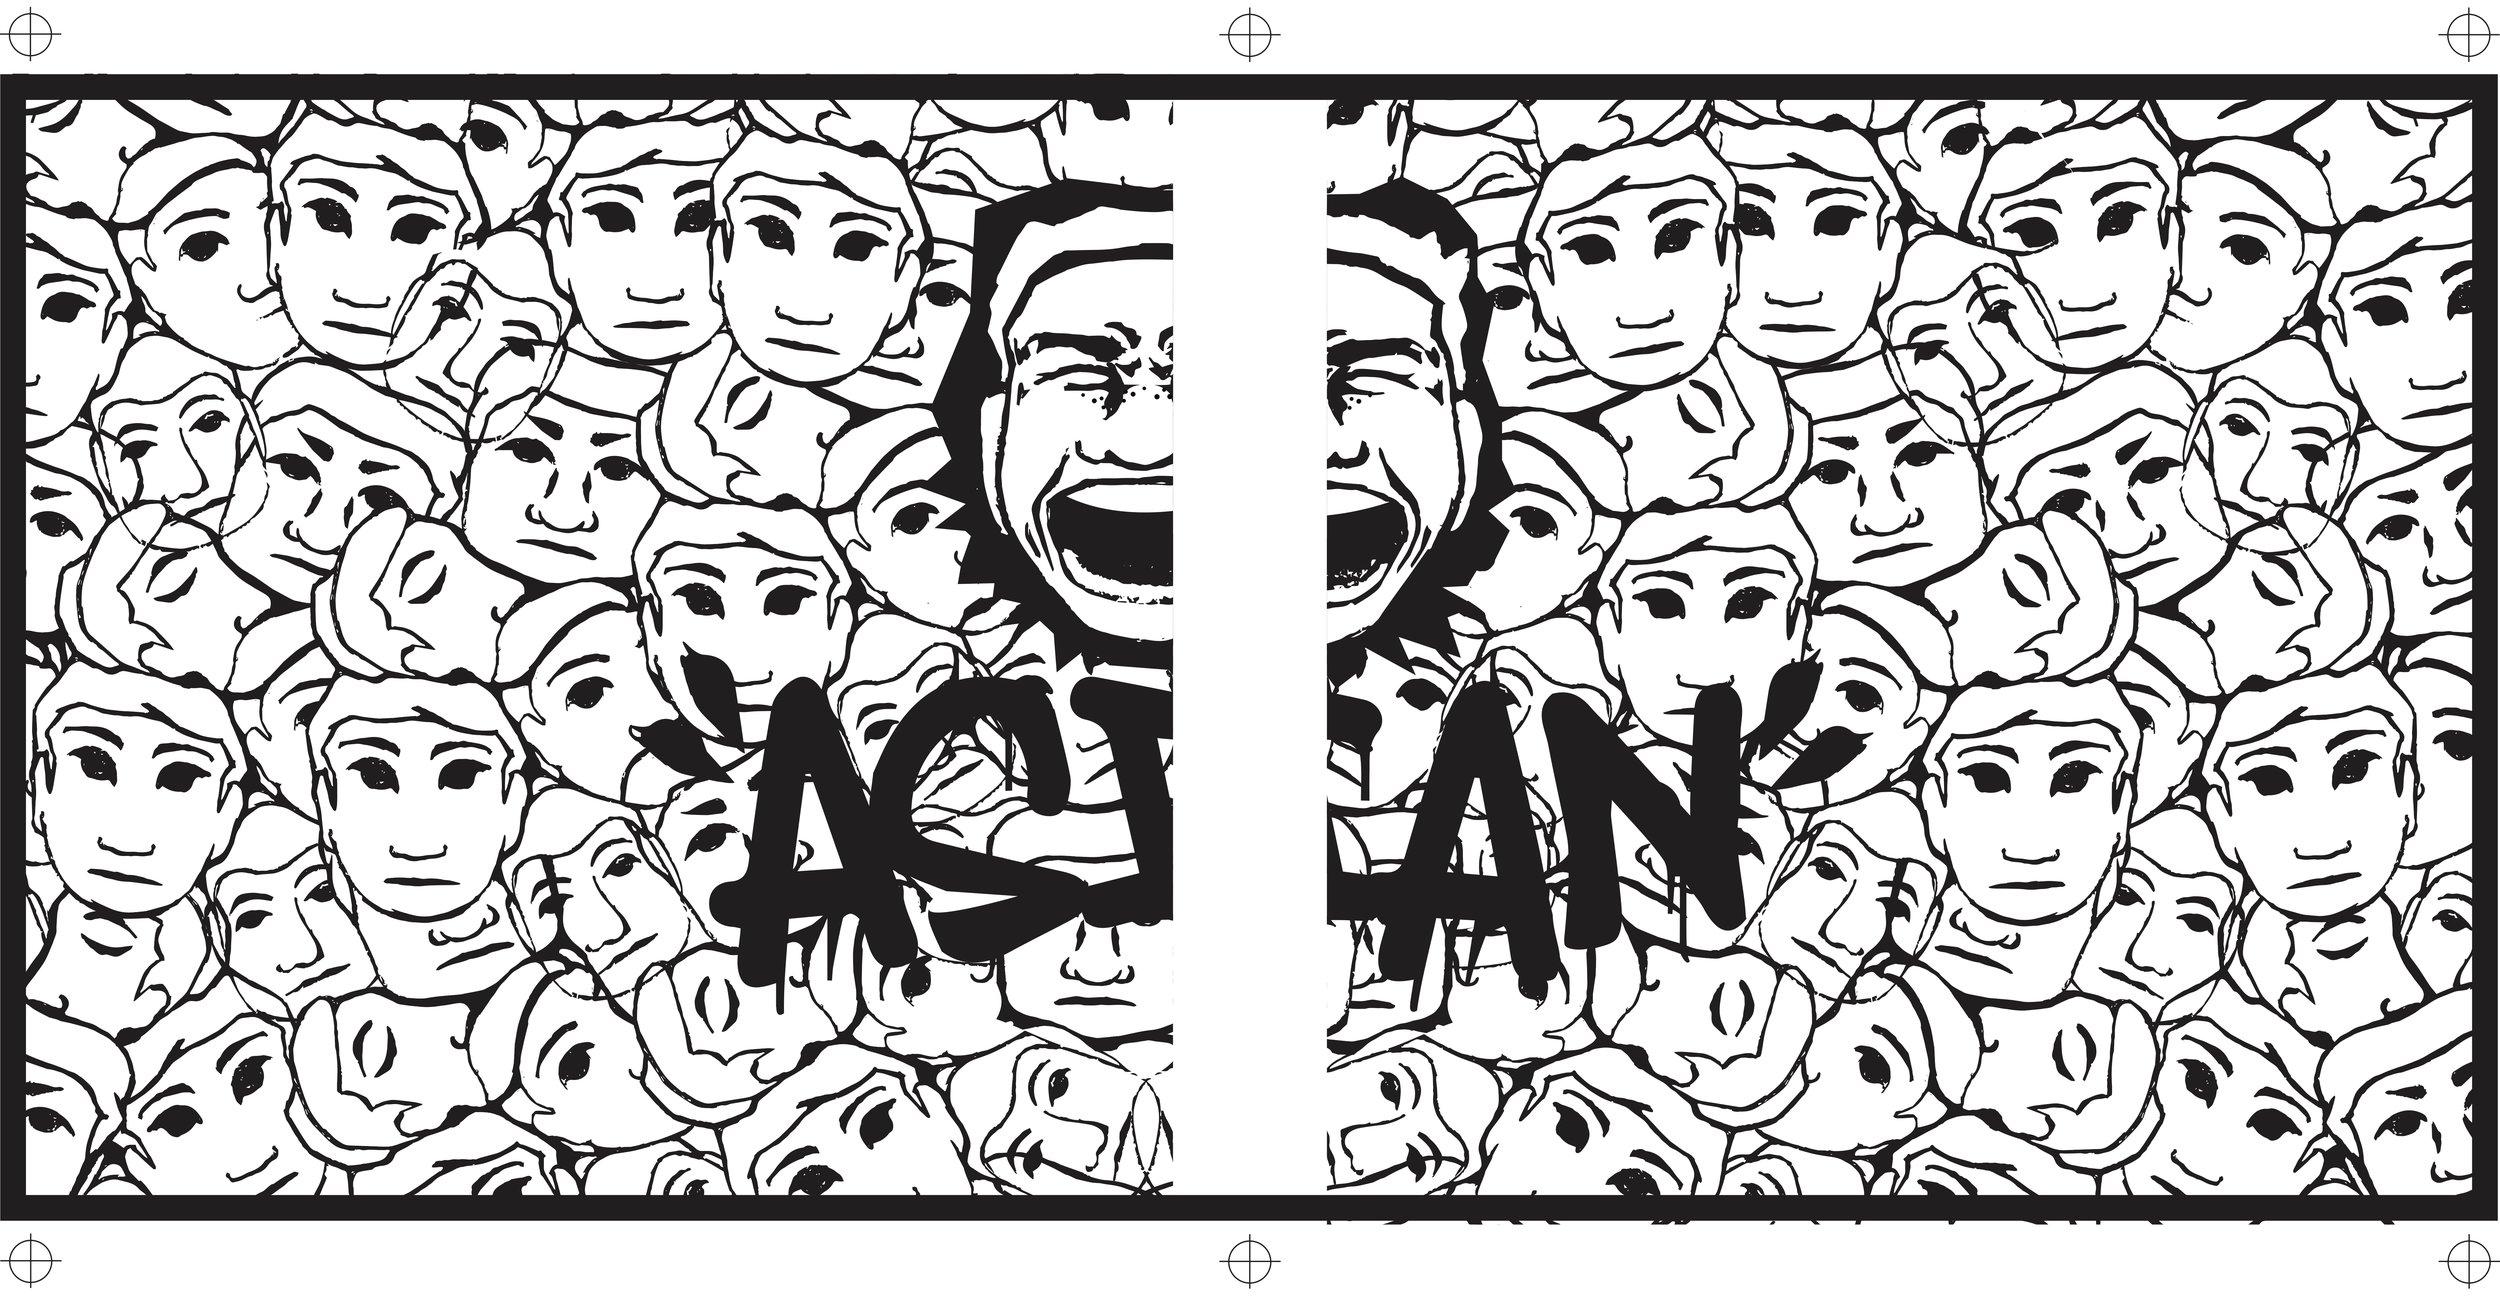 Asian Faces copy.jpg